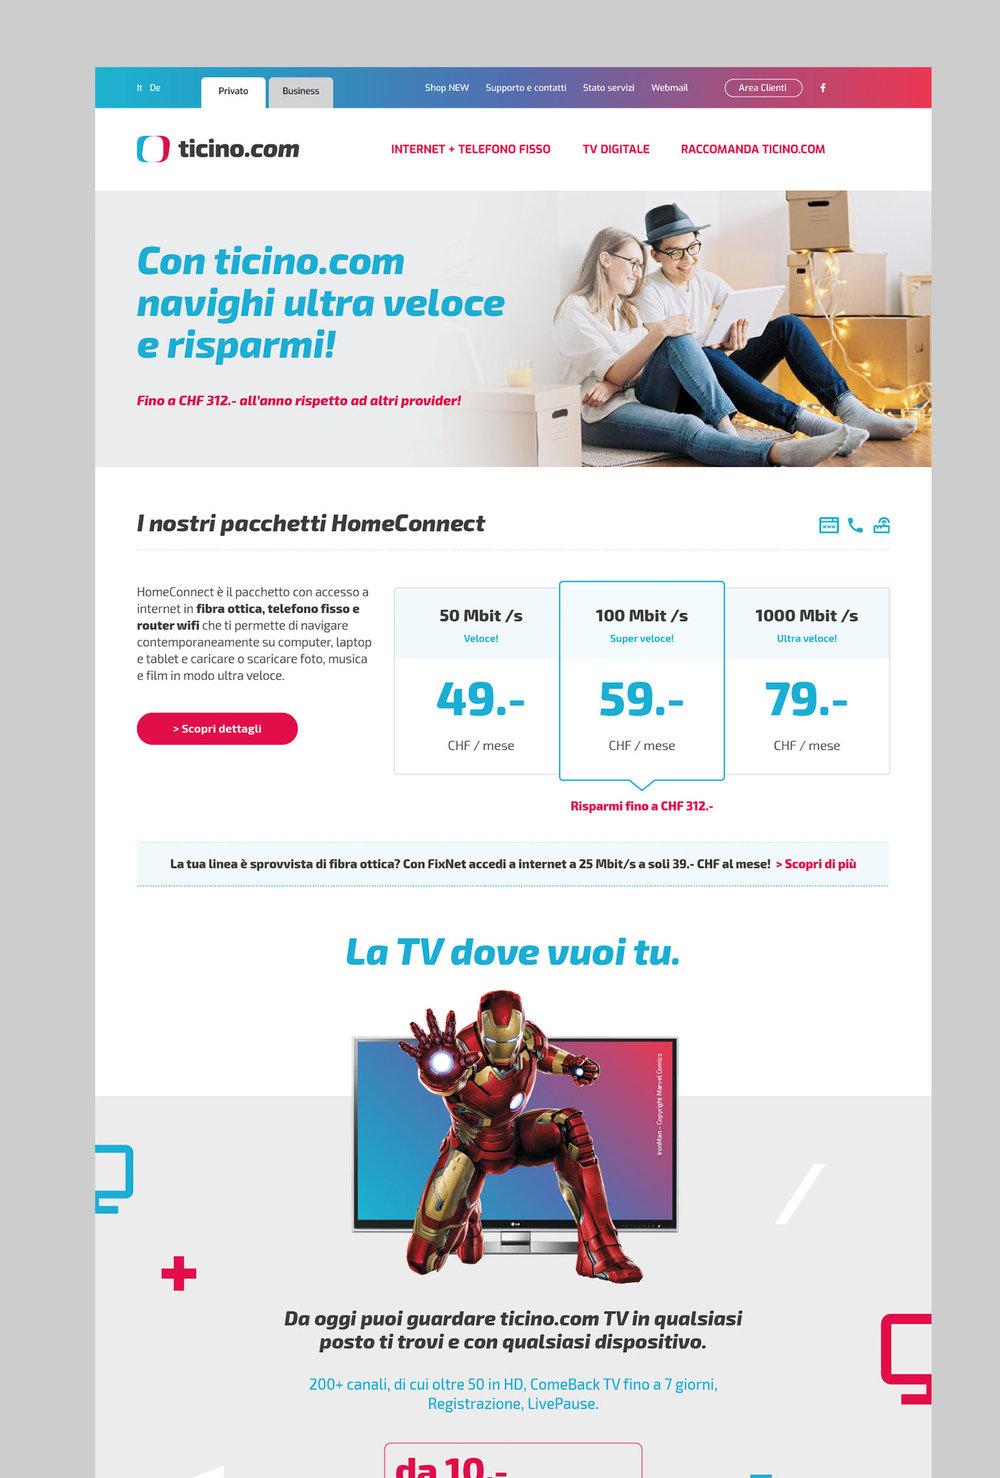 Ticinocom_web1.jpg